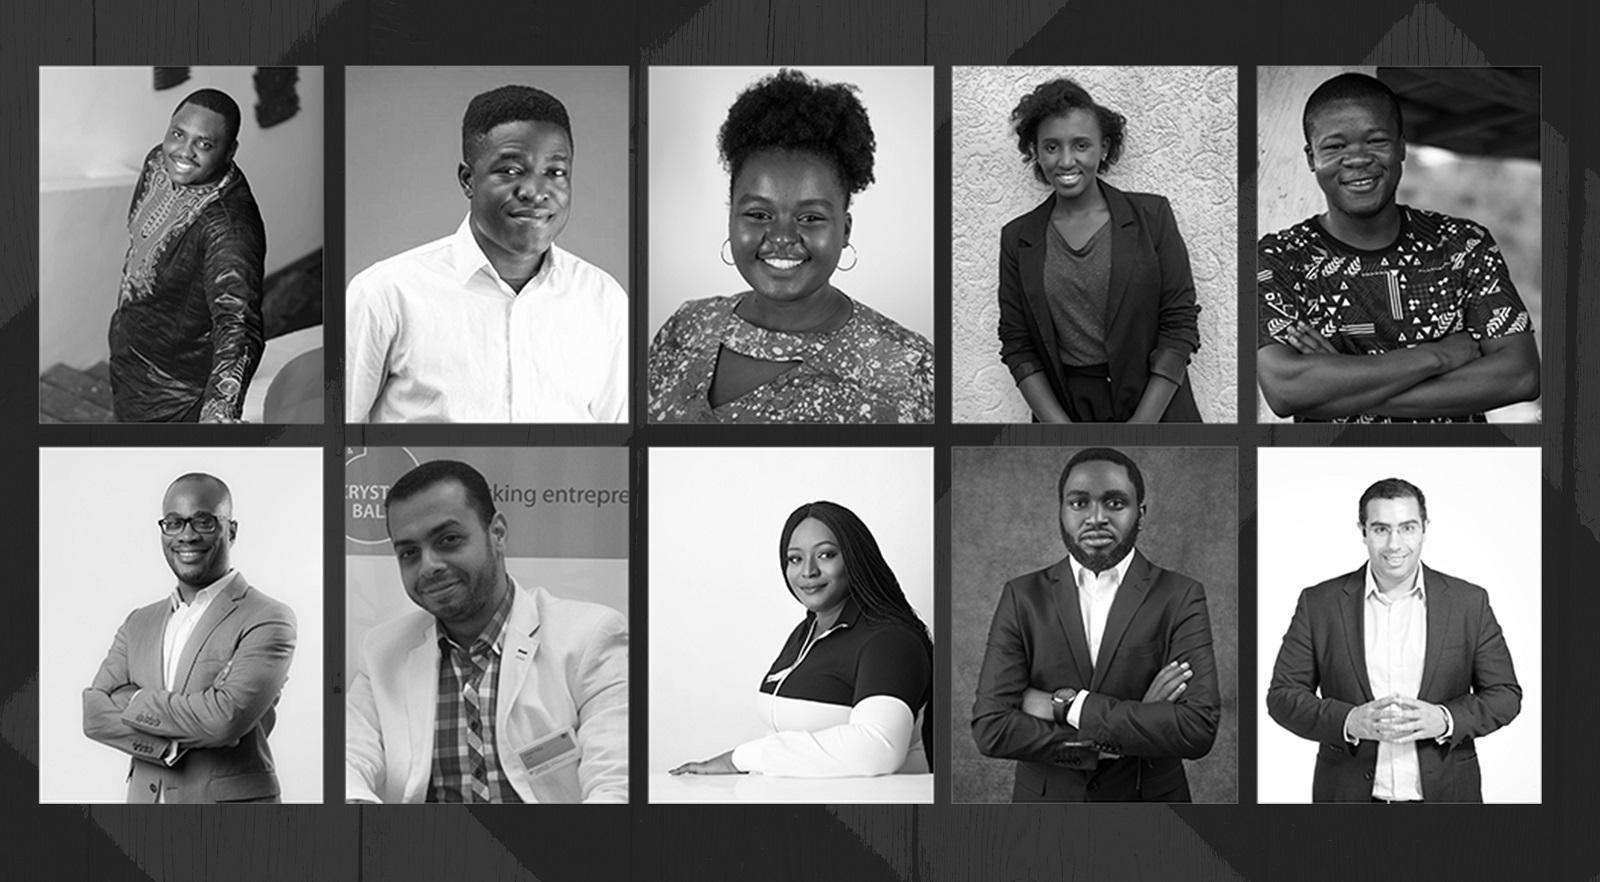 Africa Netpreneur Prize Initiative announces 10 finalists in running for share of $1m - Ventureburn